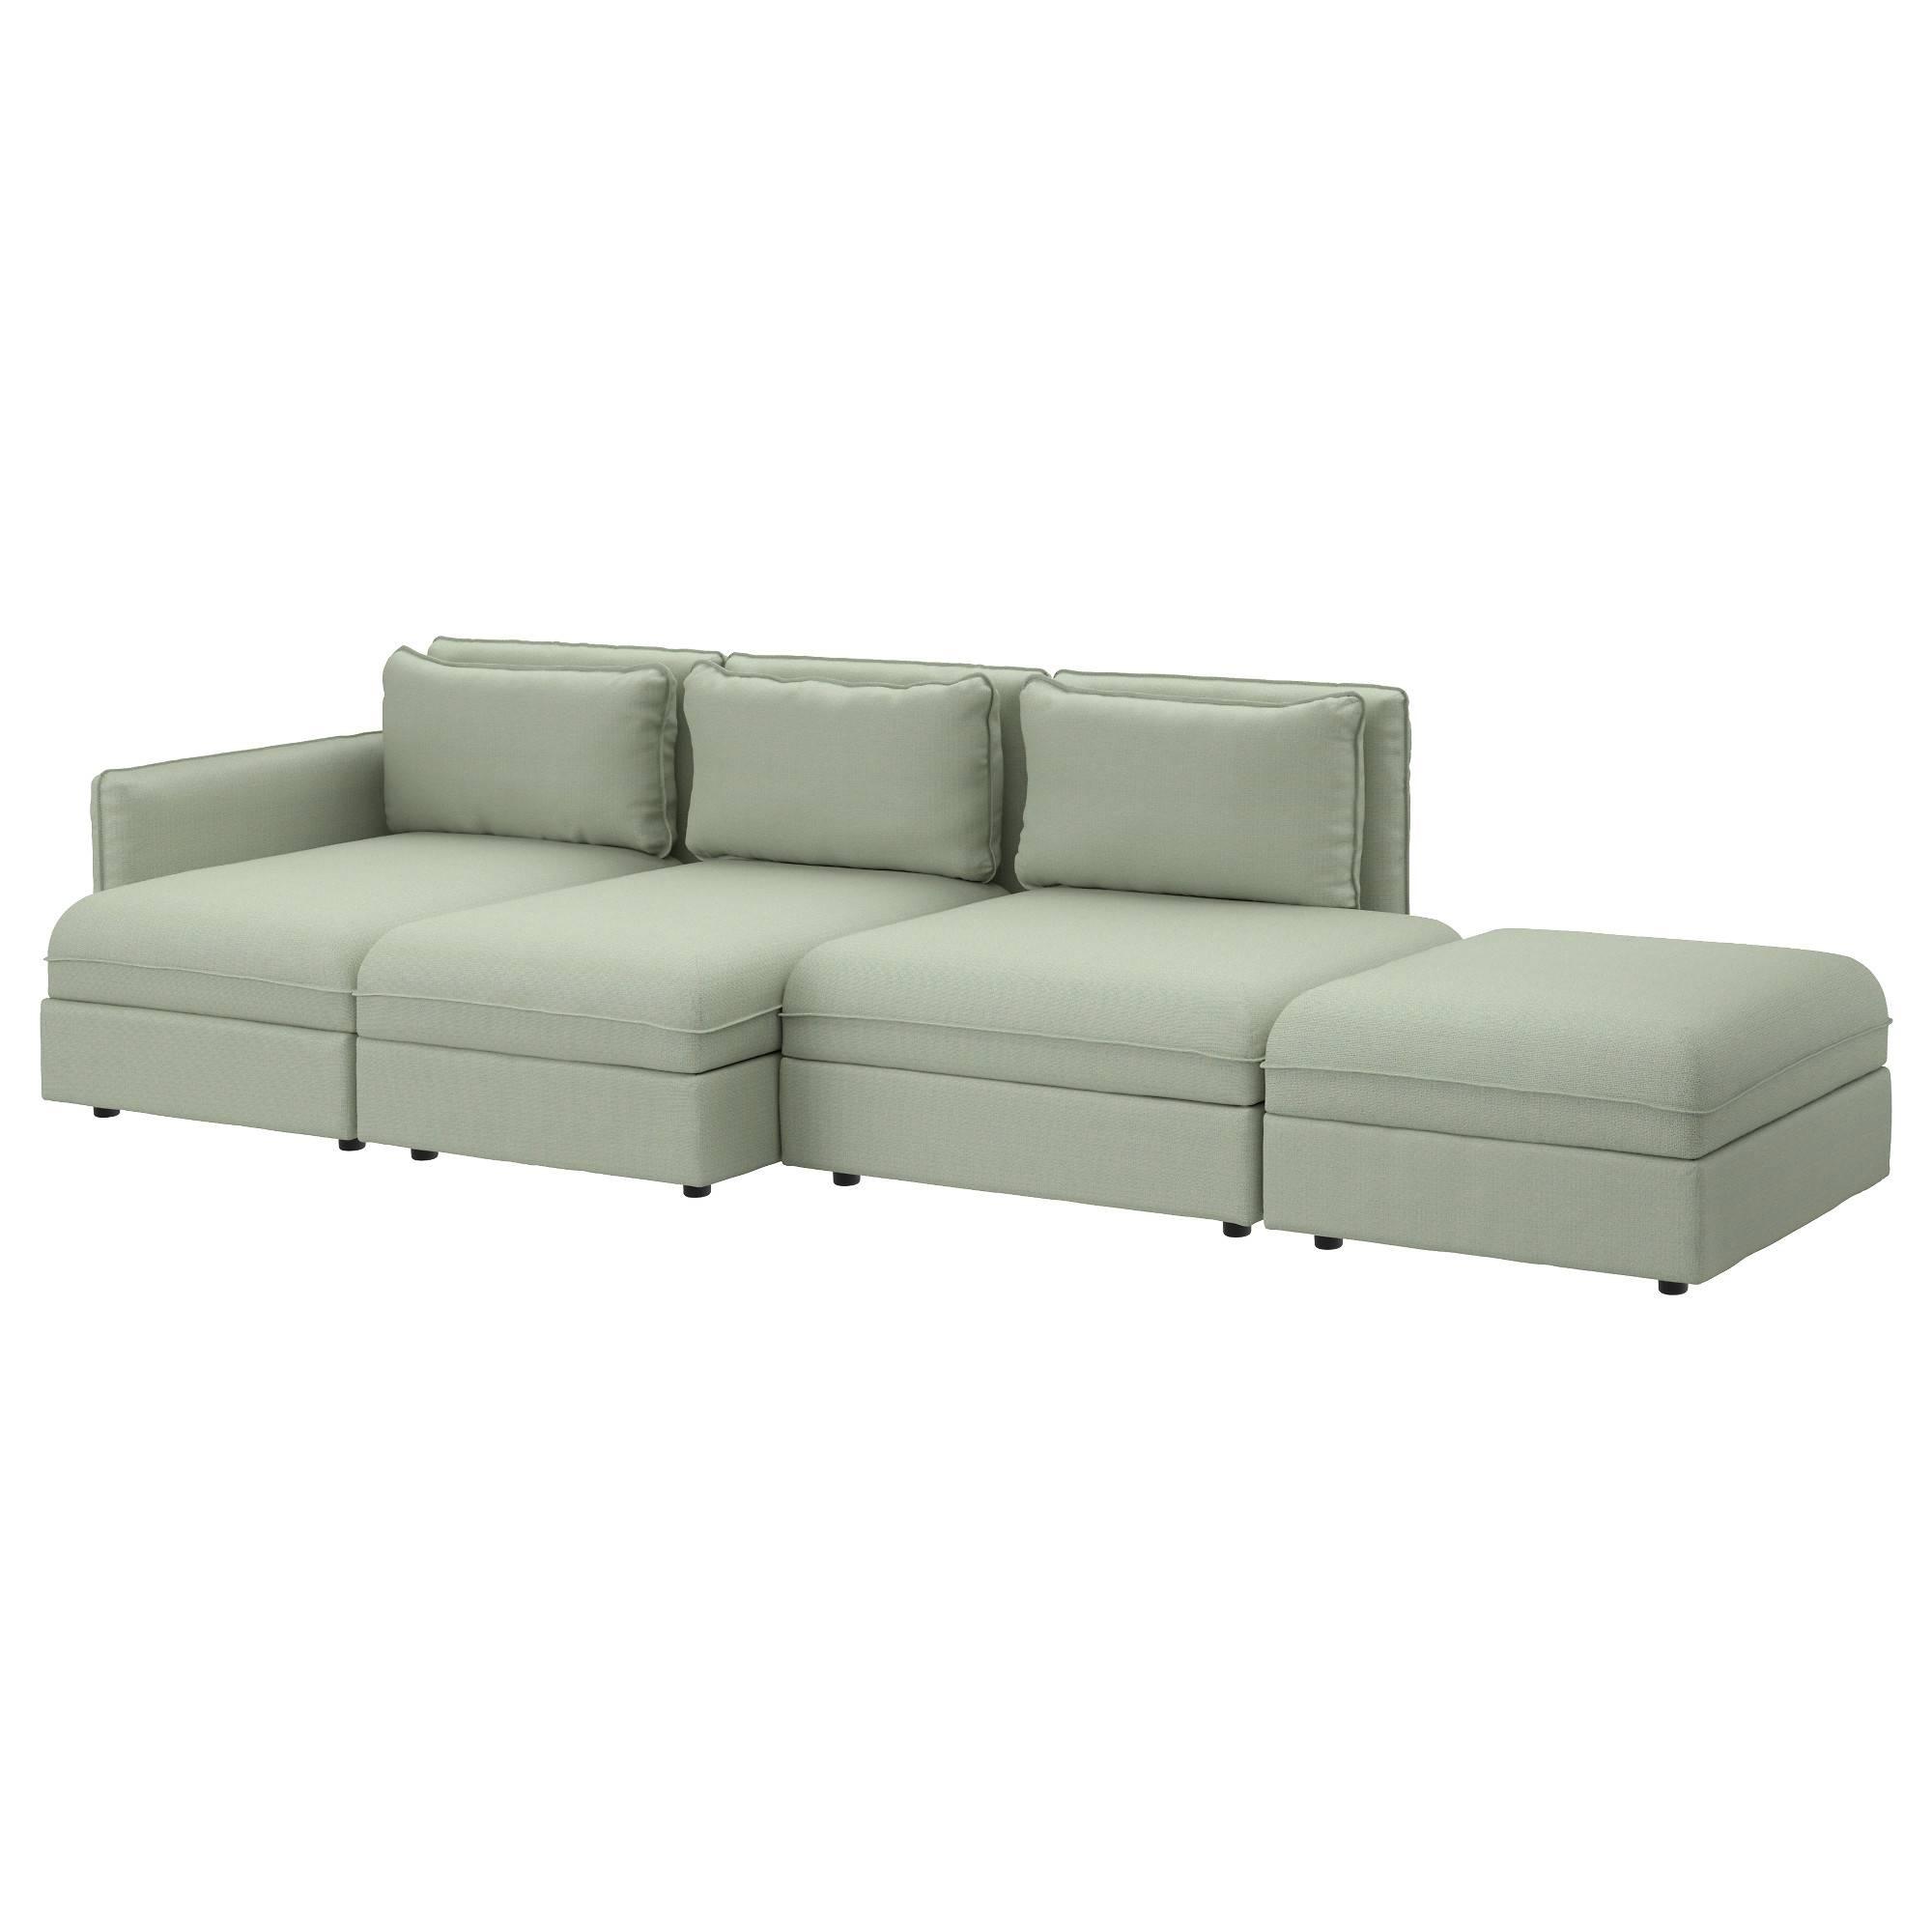 Vallentuna 4-Seat Sofa Hillared Green - Ikea regarding 4 Seat Sofas (Image 28 of 30)